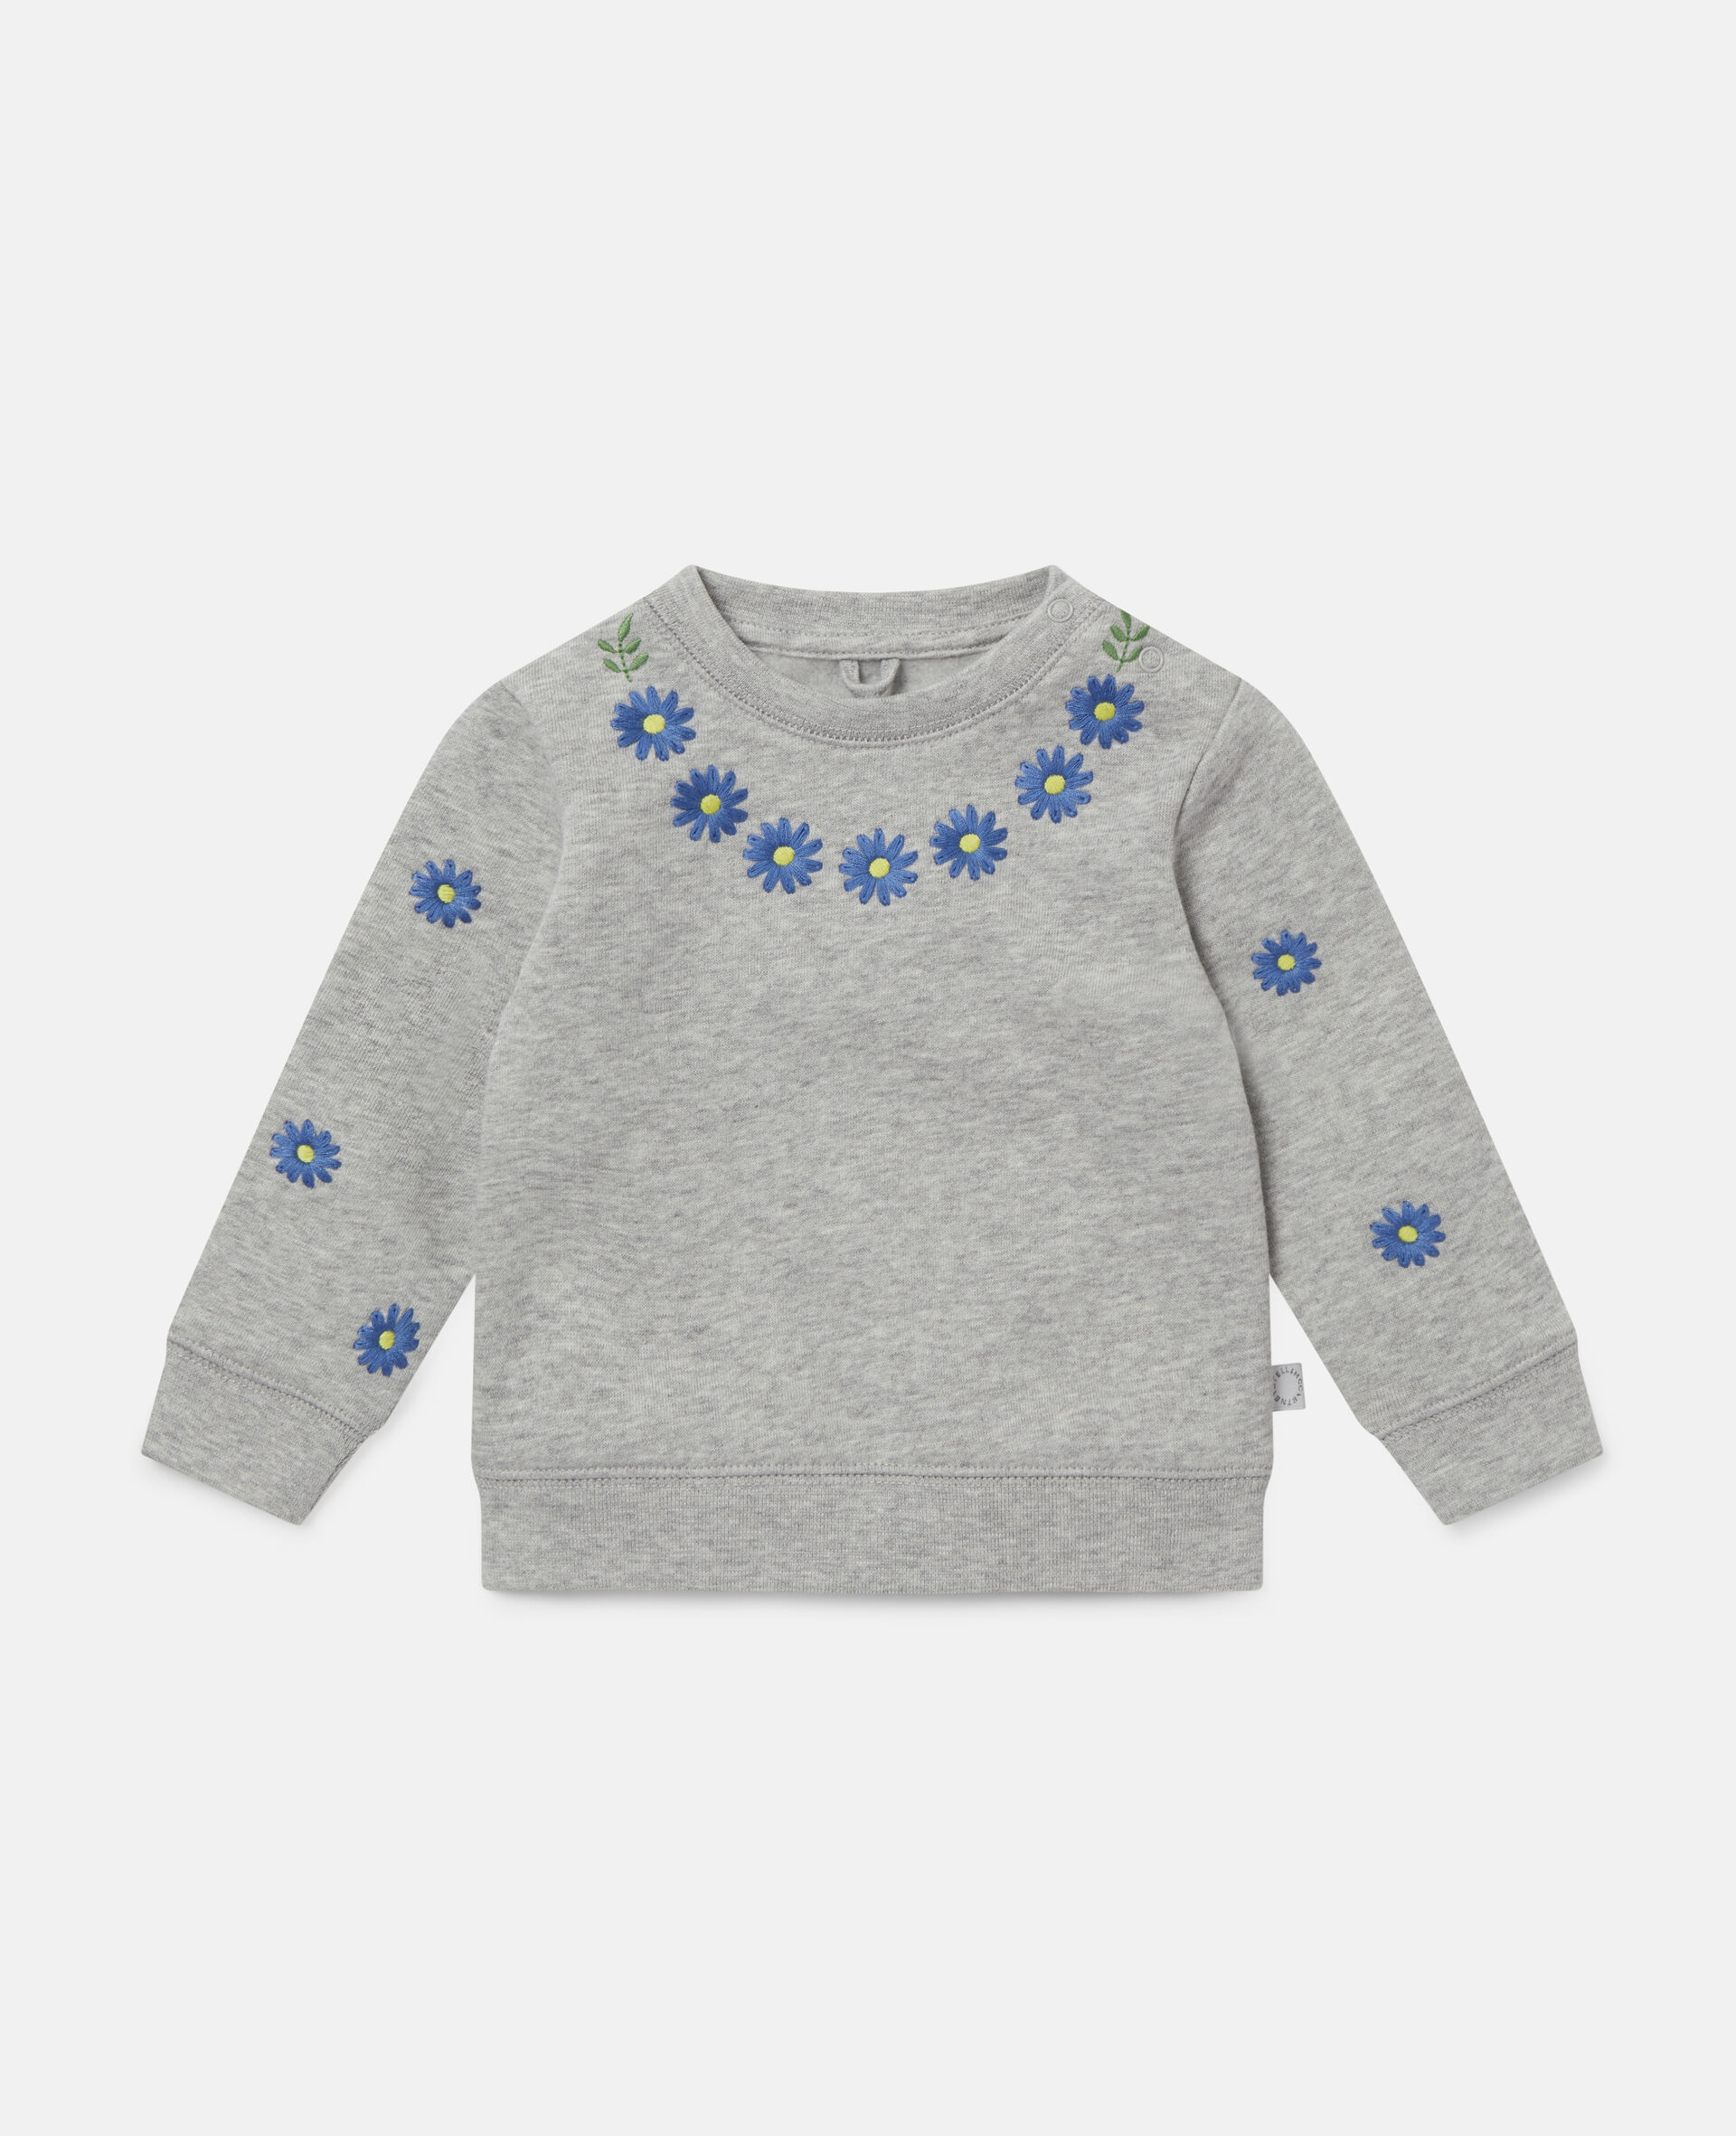 Fleece-Sweatshirt mit Gänseblümchenstickerei -Grau-large image number 0